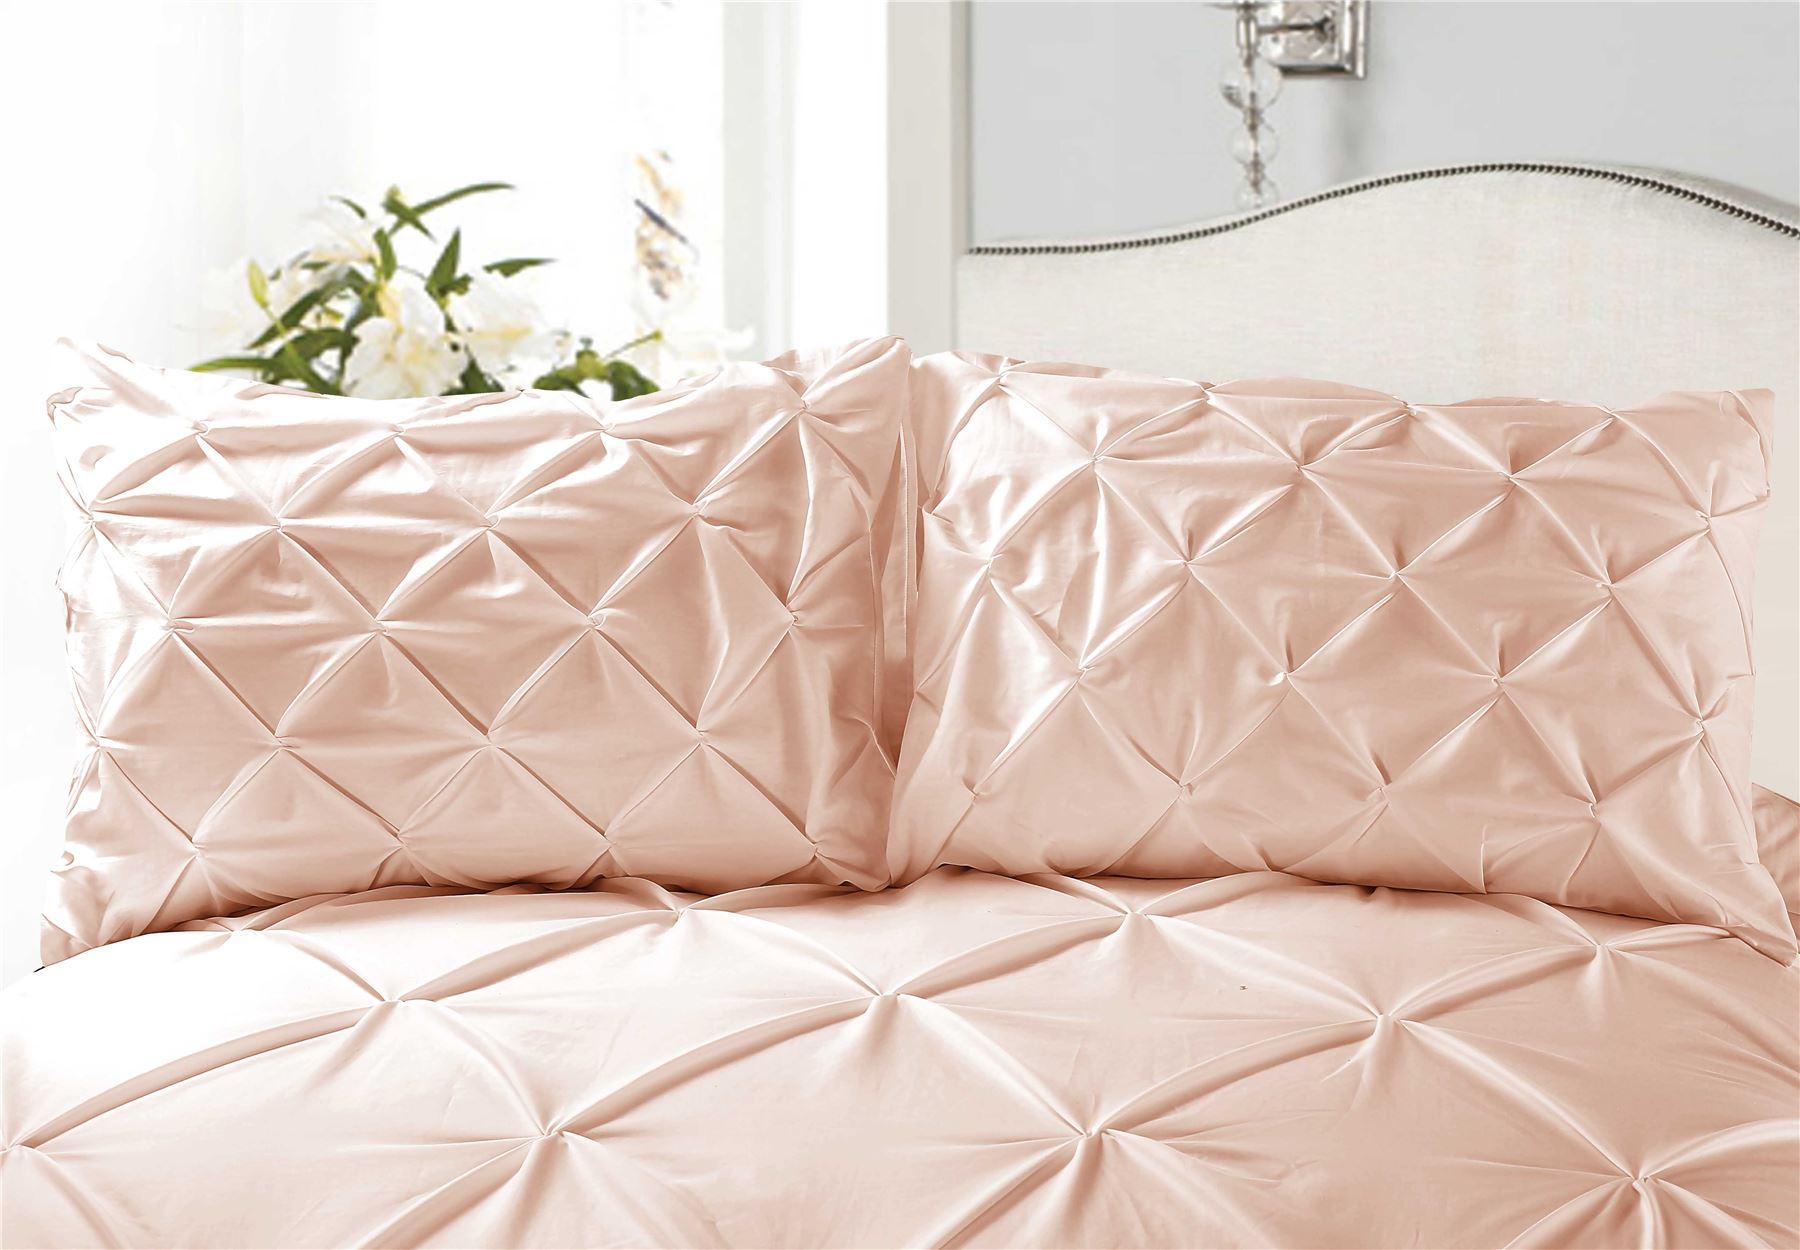 Luxury-Pure-100-Cotton-200-Thread-Pinch-Pleat-Pintuck-Puckering-Duvet-Cover-Set thumbnail 4